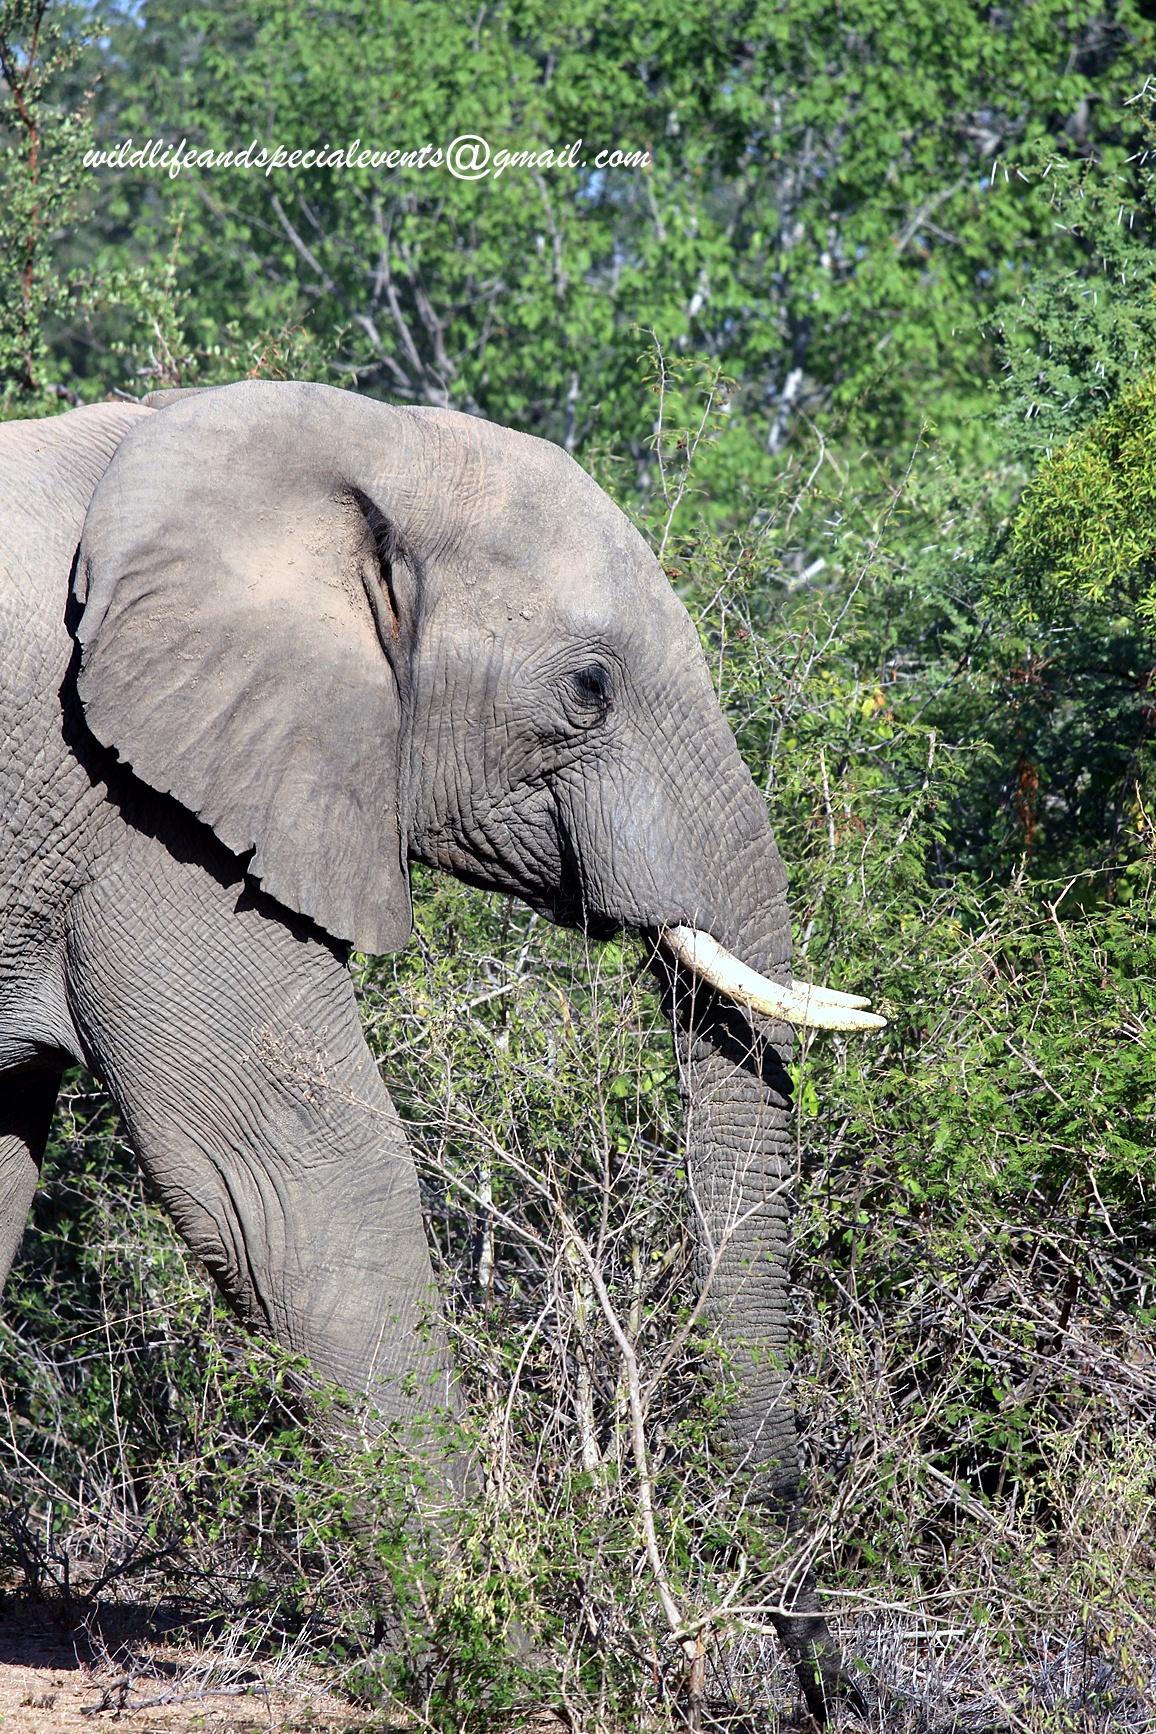 Elephant in Africa by oosie